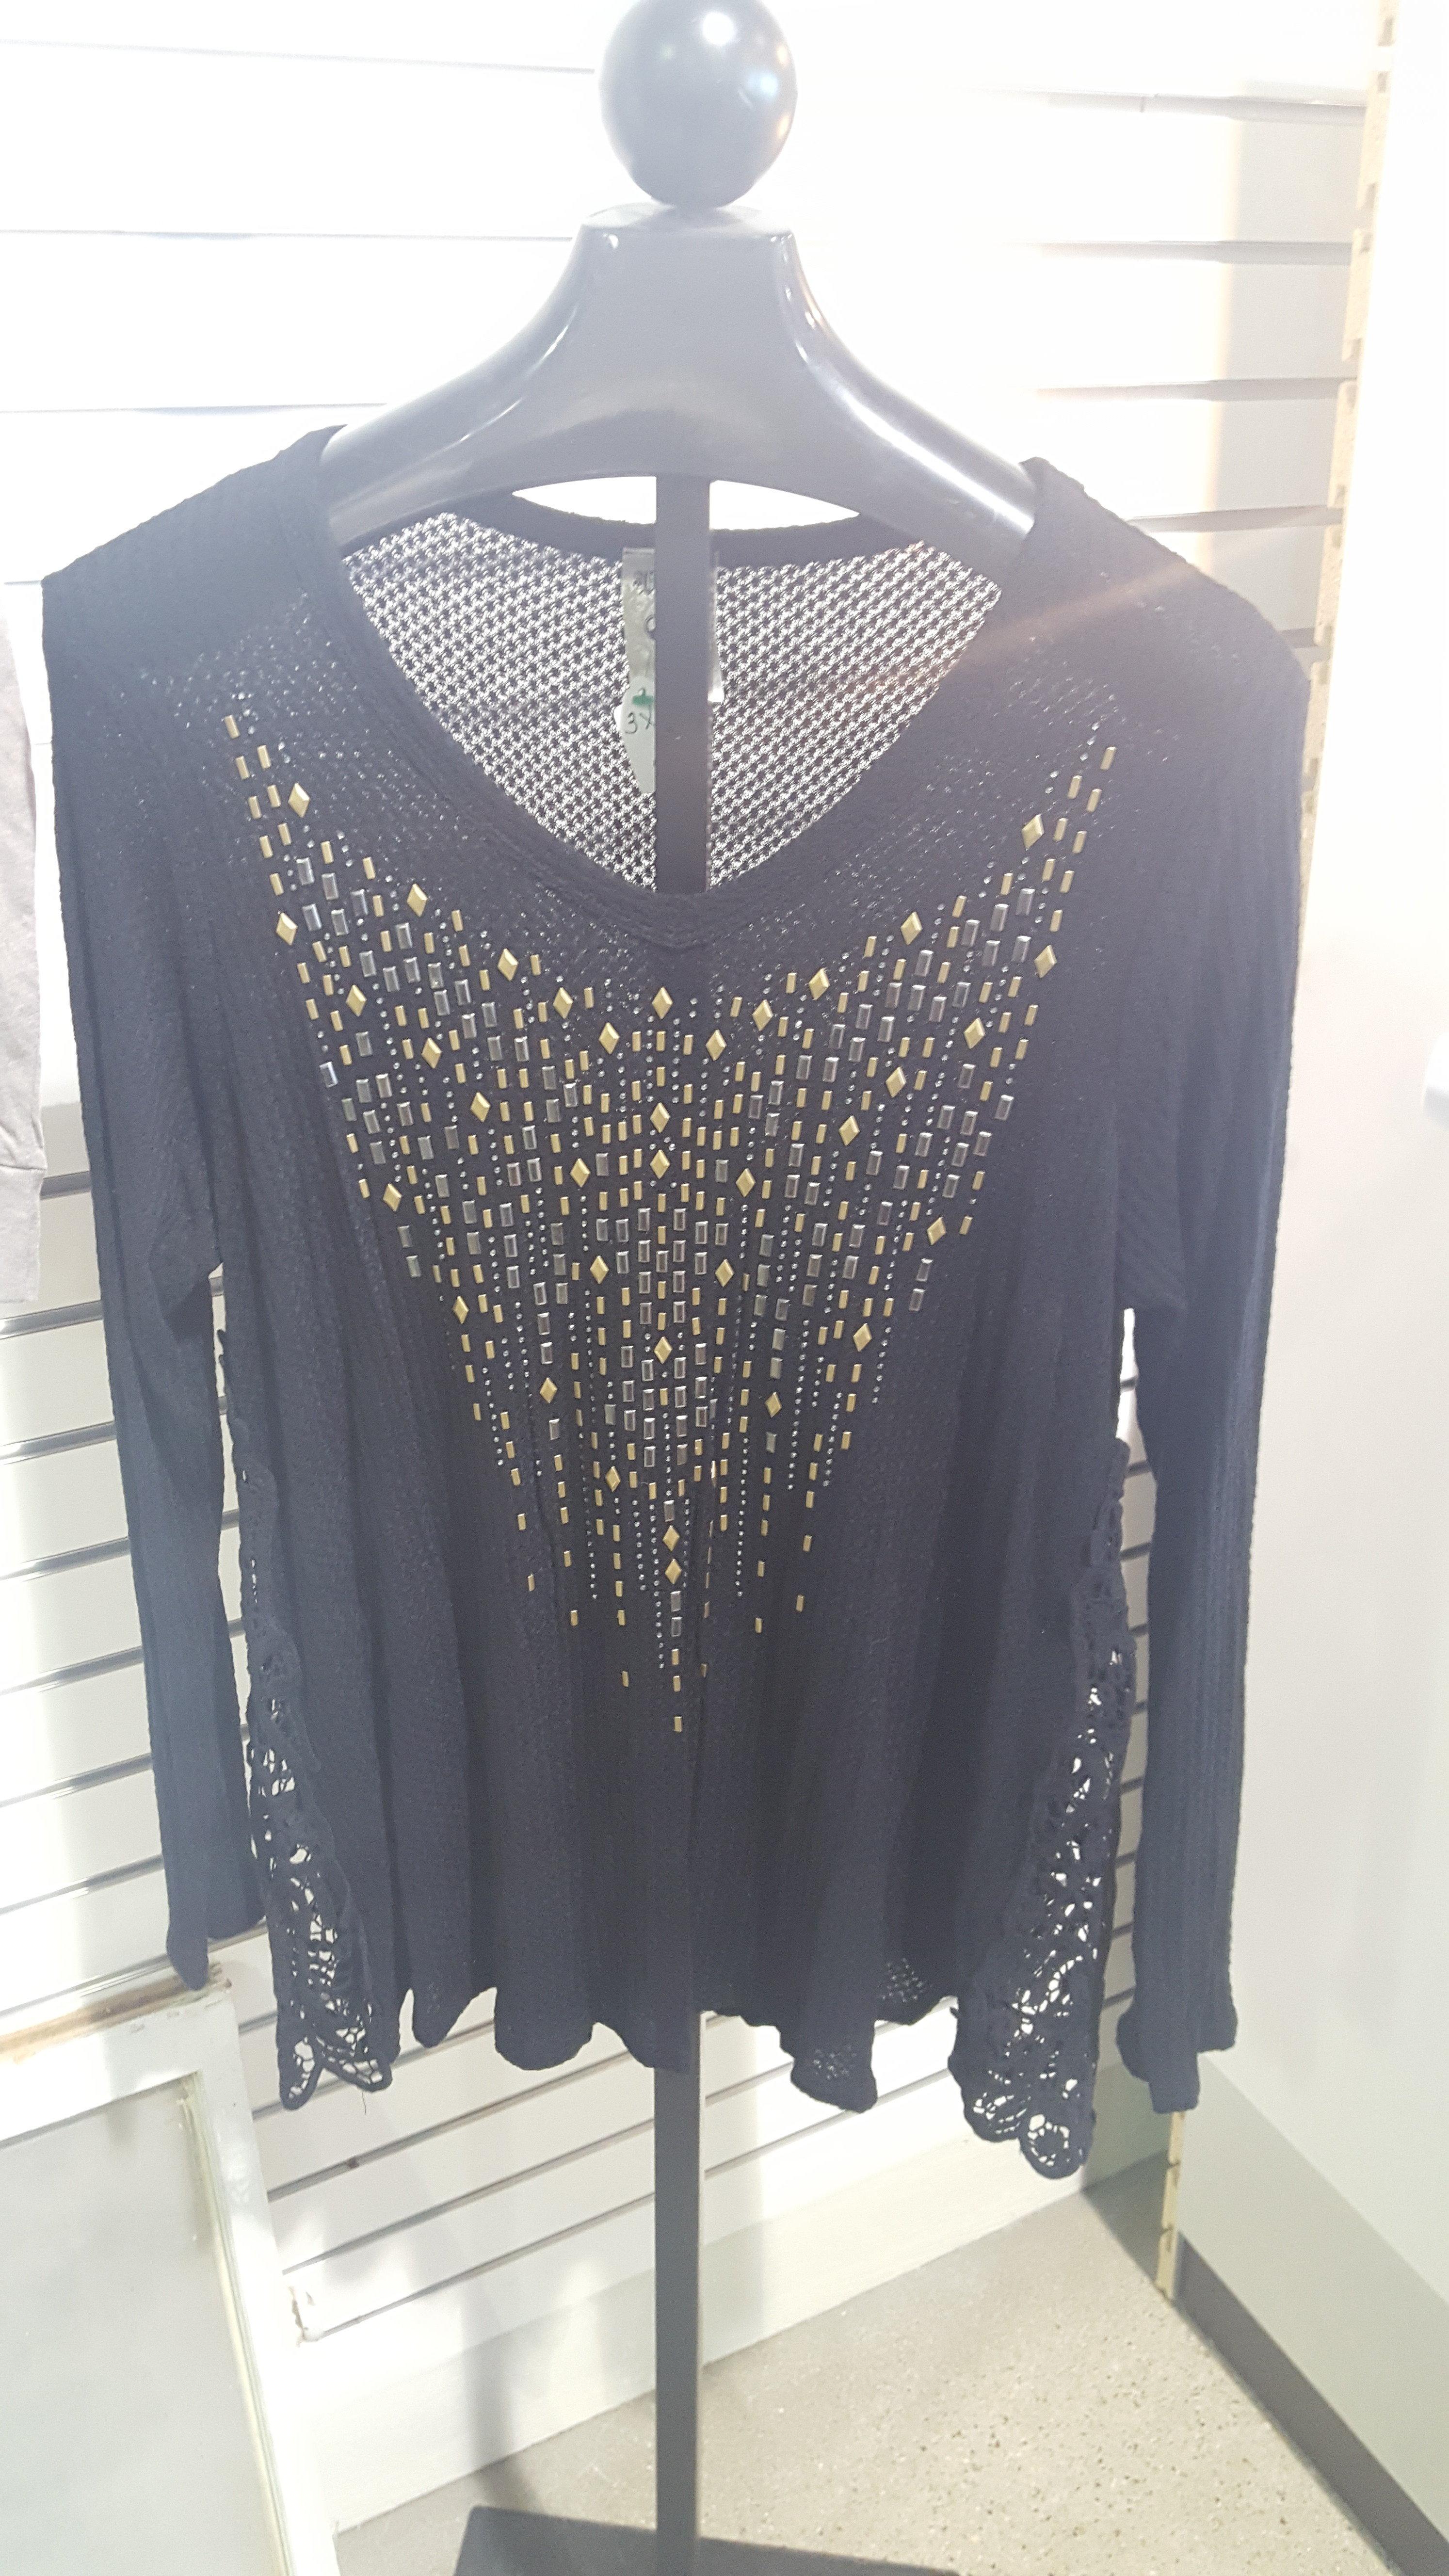 Vocal Black Shirt Plus Size 1W30ZGGRSD81T